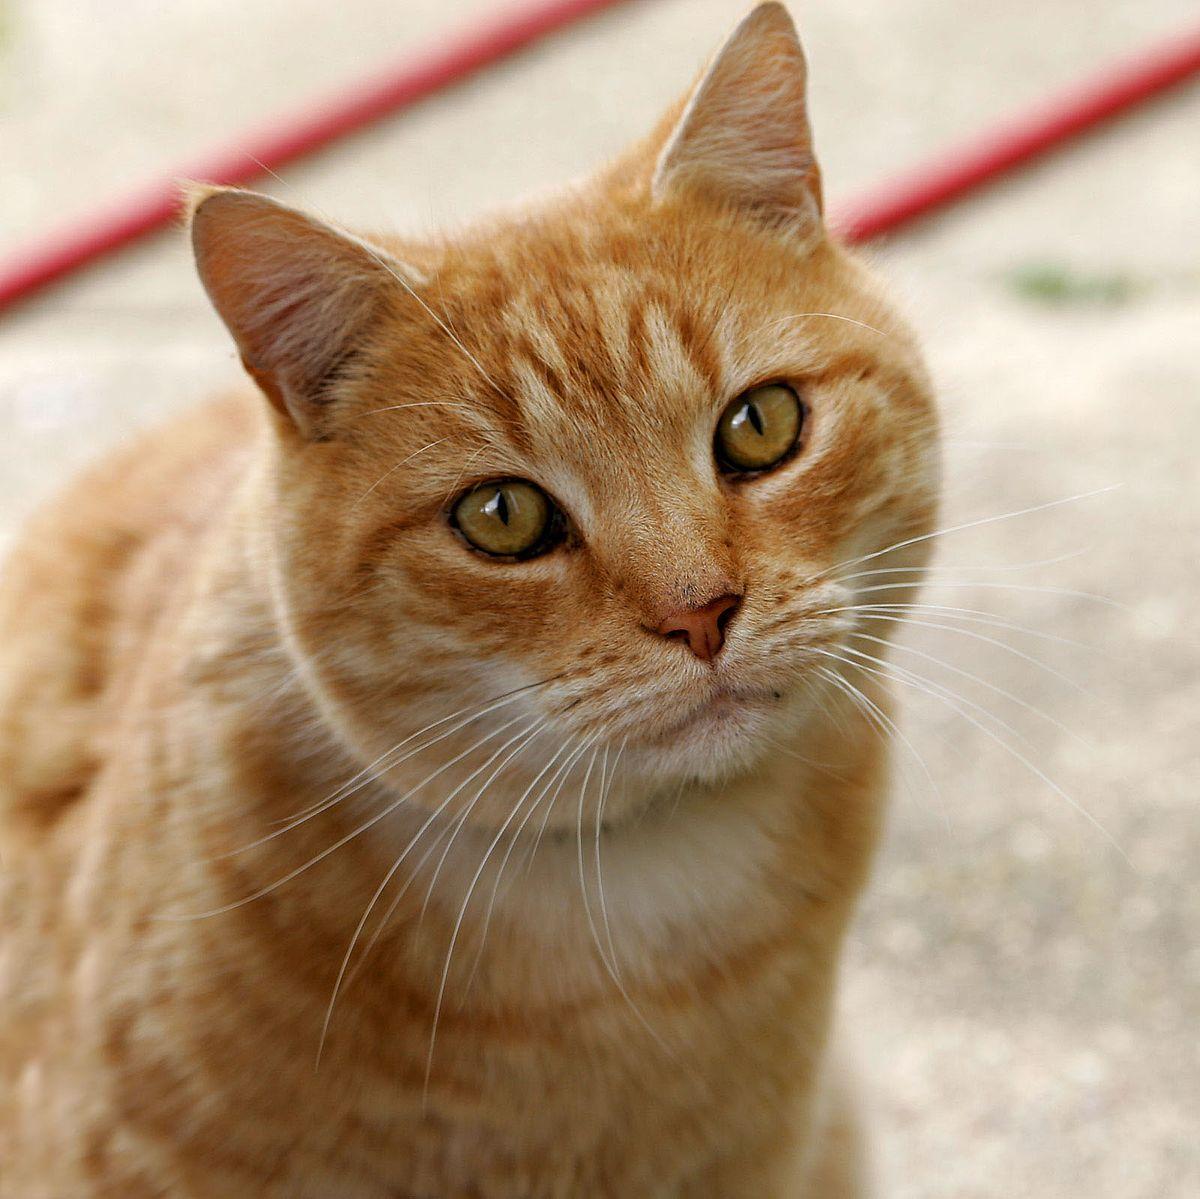 Cat Litter- Sorting The Best One For Your Little Kitten